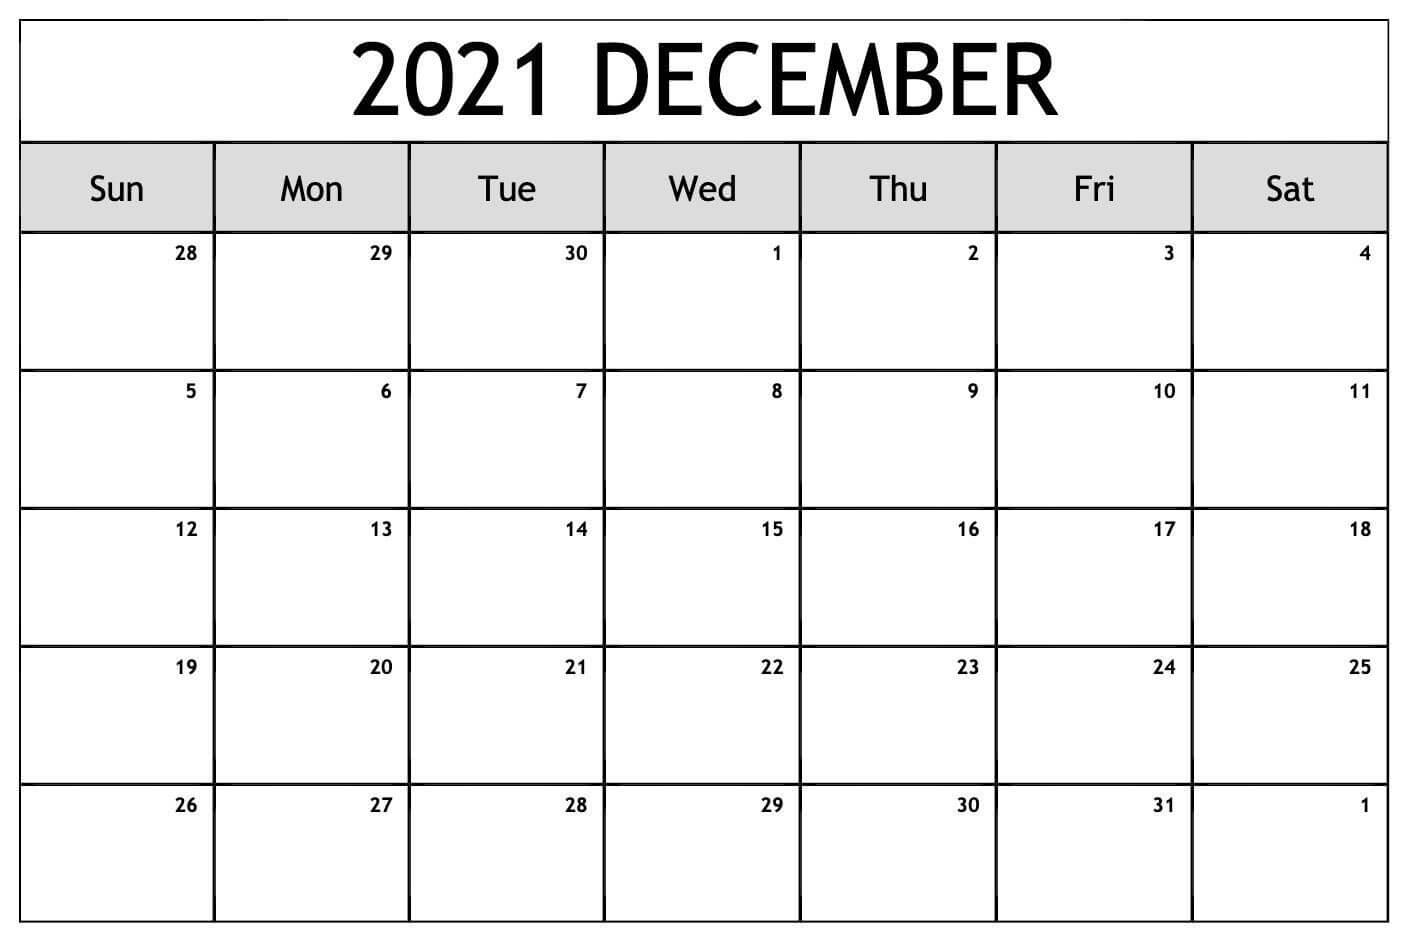 Fillable December 2021 Calendar Blank